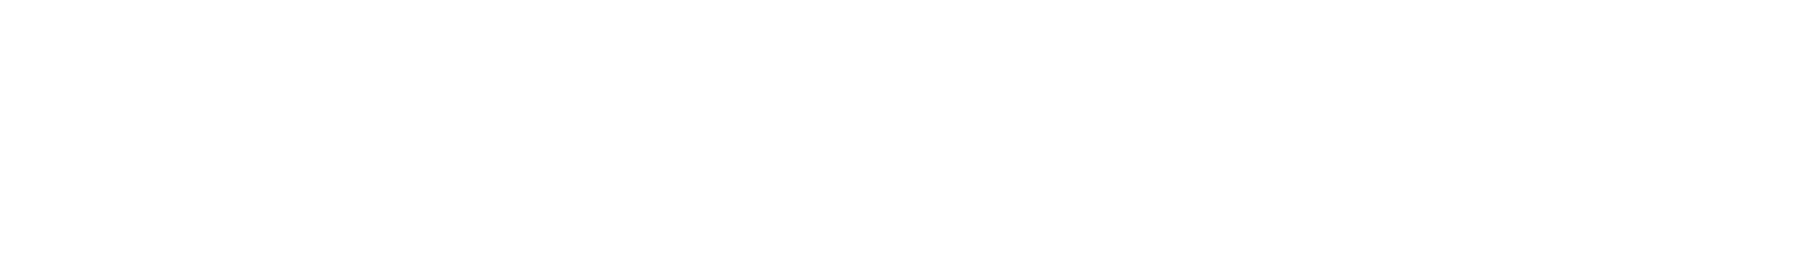 vedh synth cut 261 cm